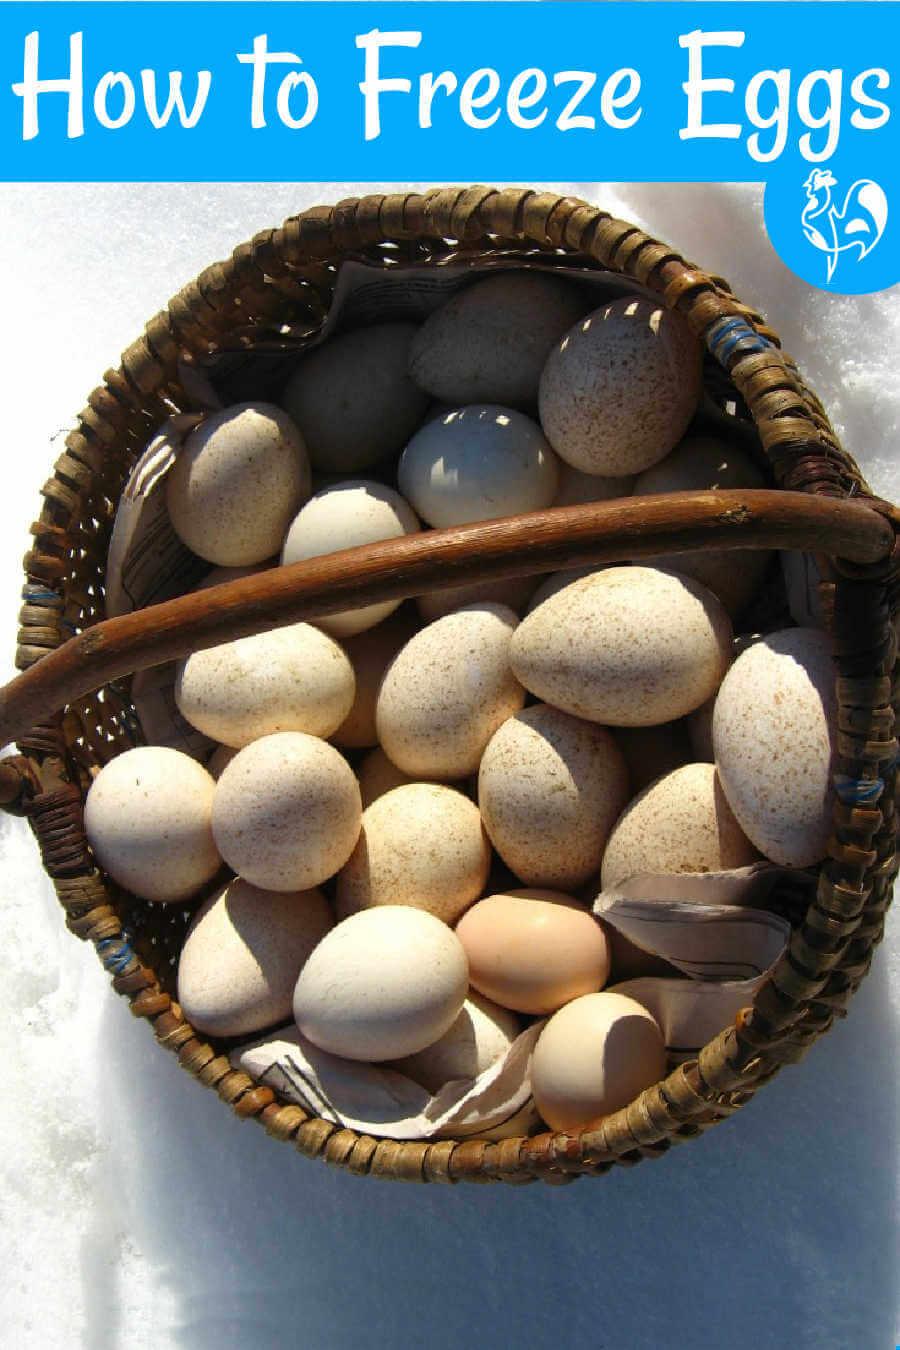 Eggs in freezer tray.